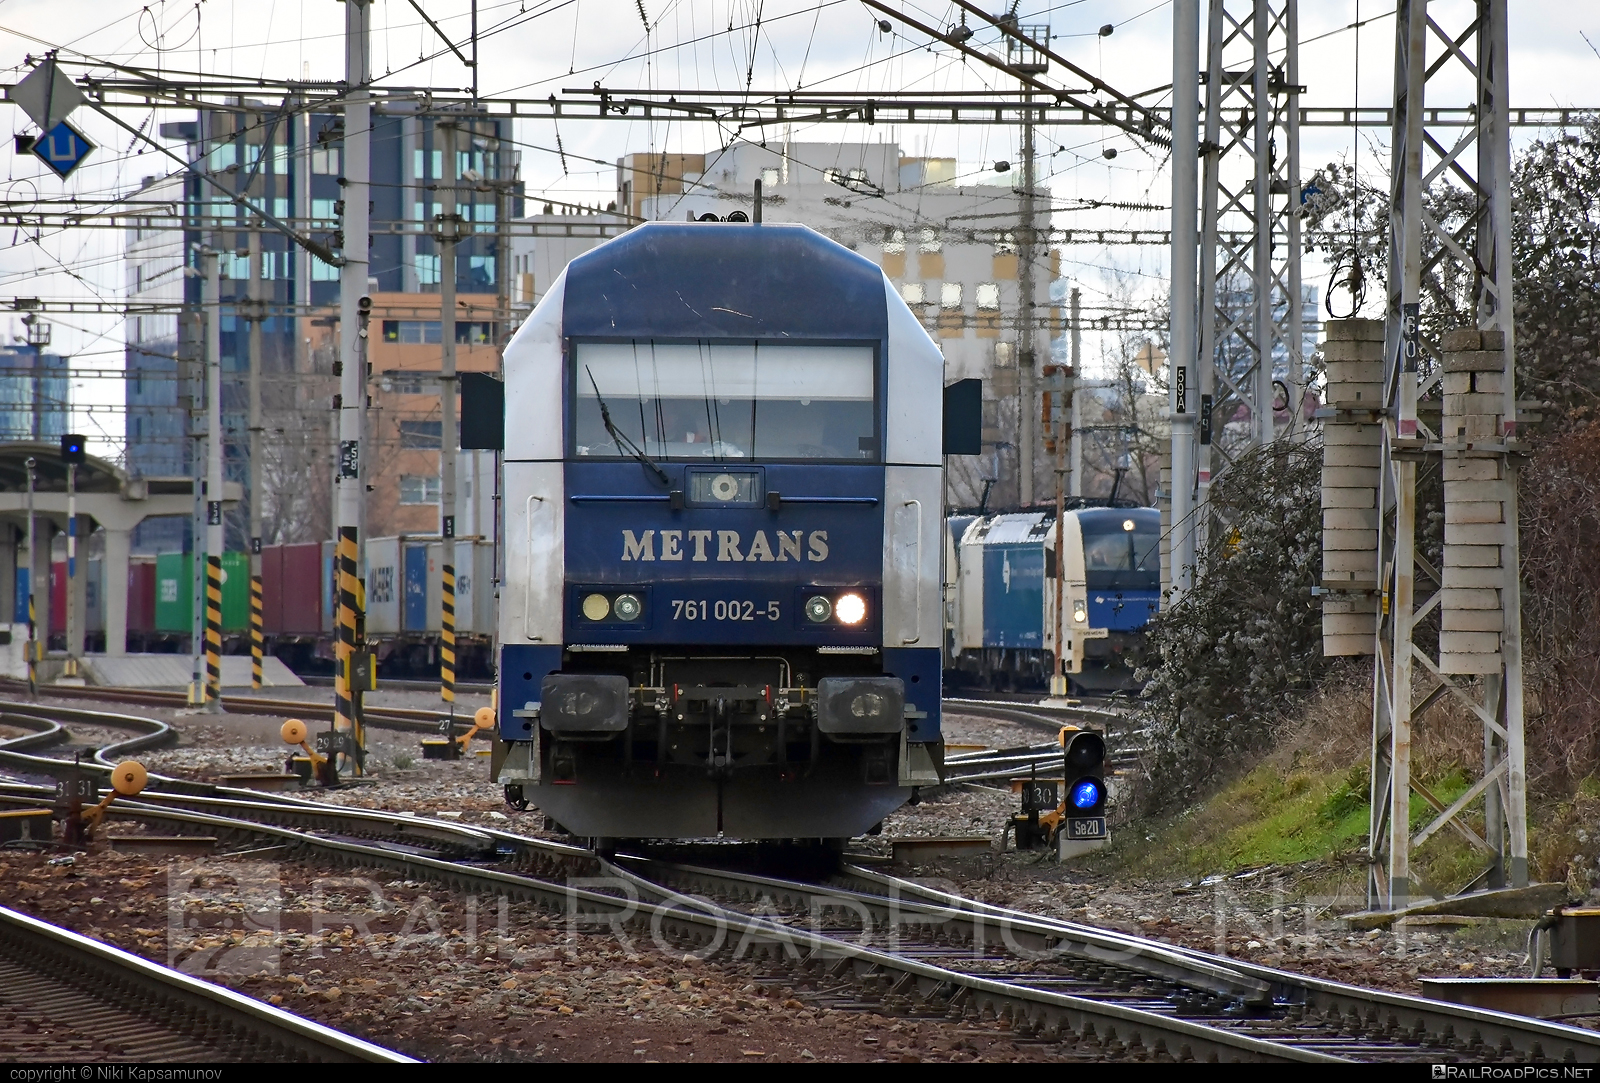 Siemens ER20 - 761 002-5 operated by METRANS (Danubia) a.s. #er20 #er20hercules #eurorunner #hercules #hhla #metrans #metransdanubia #siemens #siemenser20 #siemenser20hercules #siemenseurorunner #siemenshercules